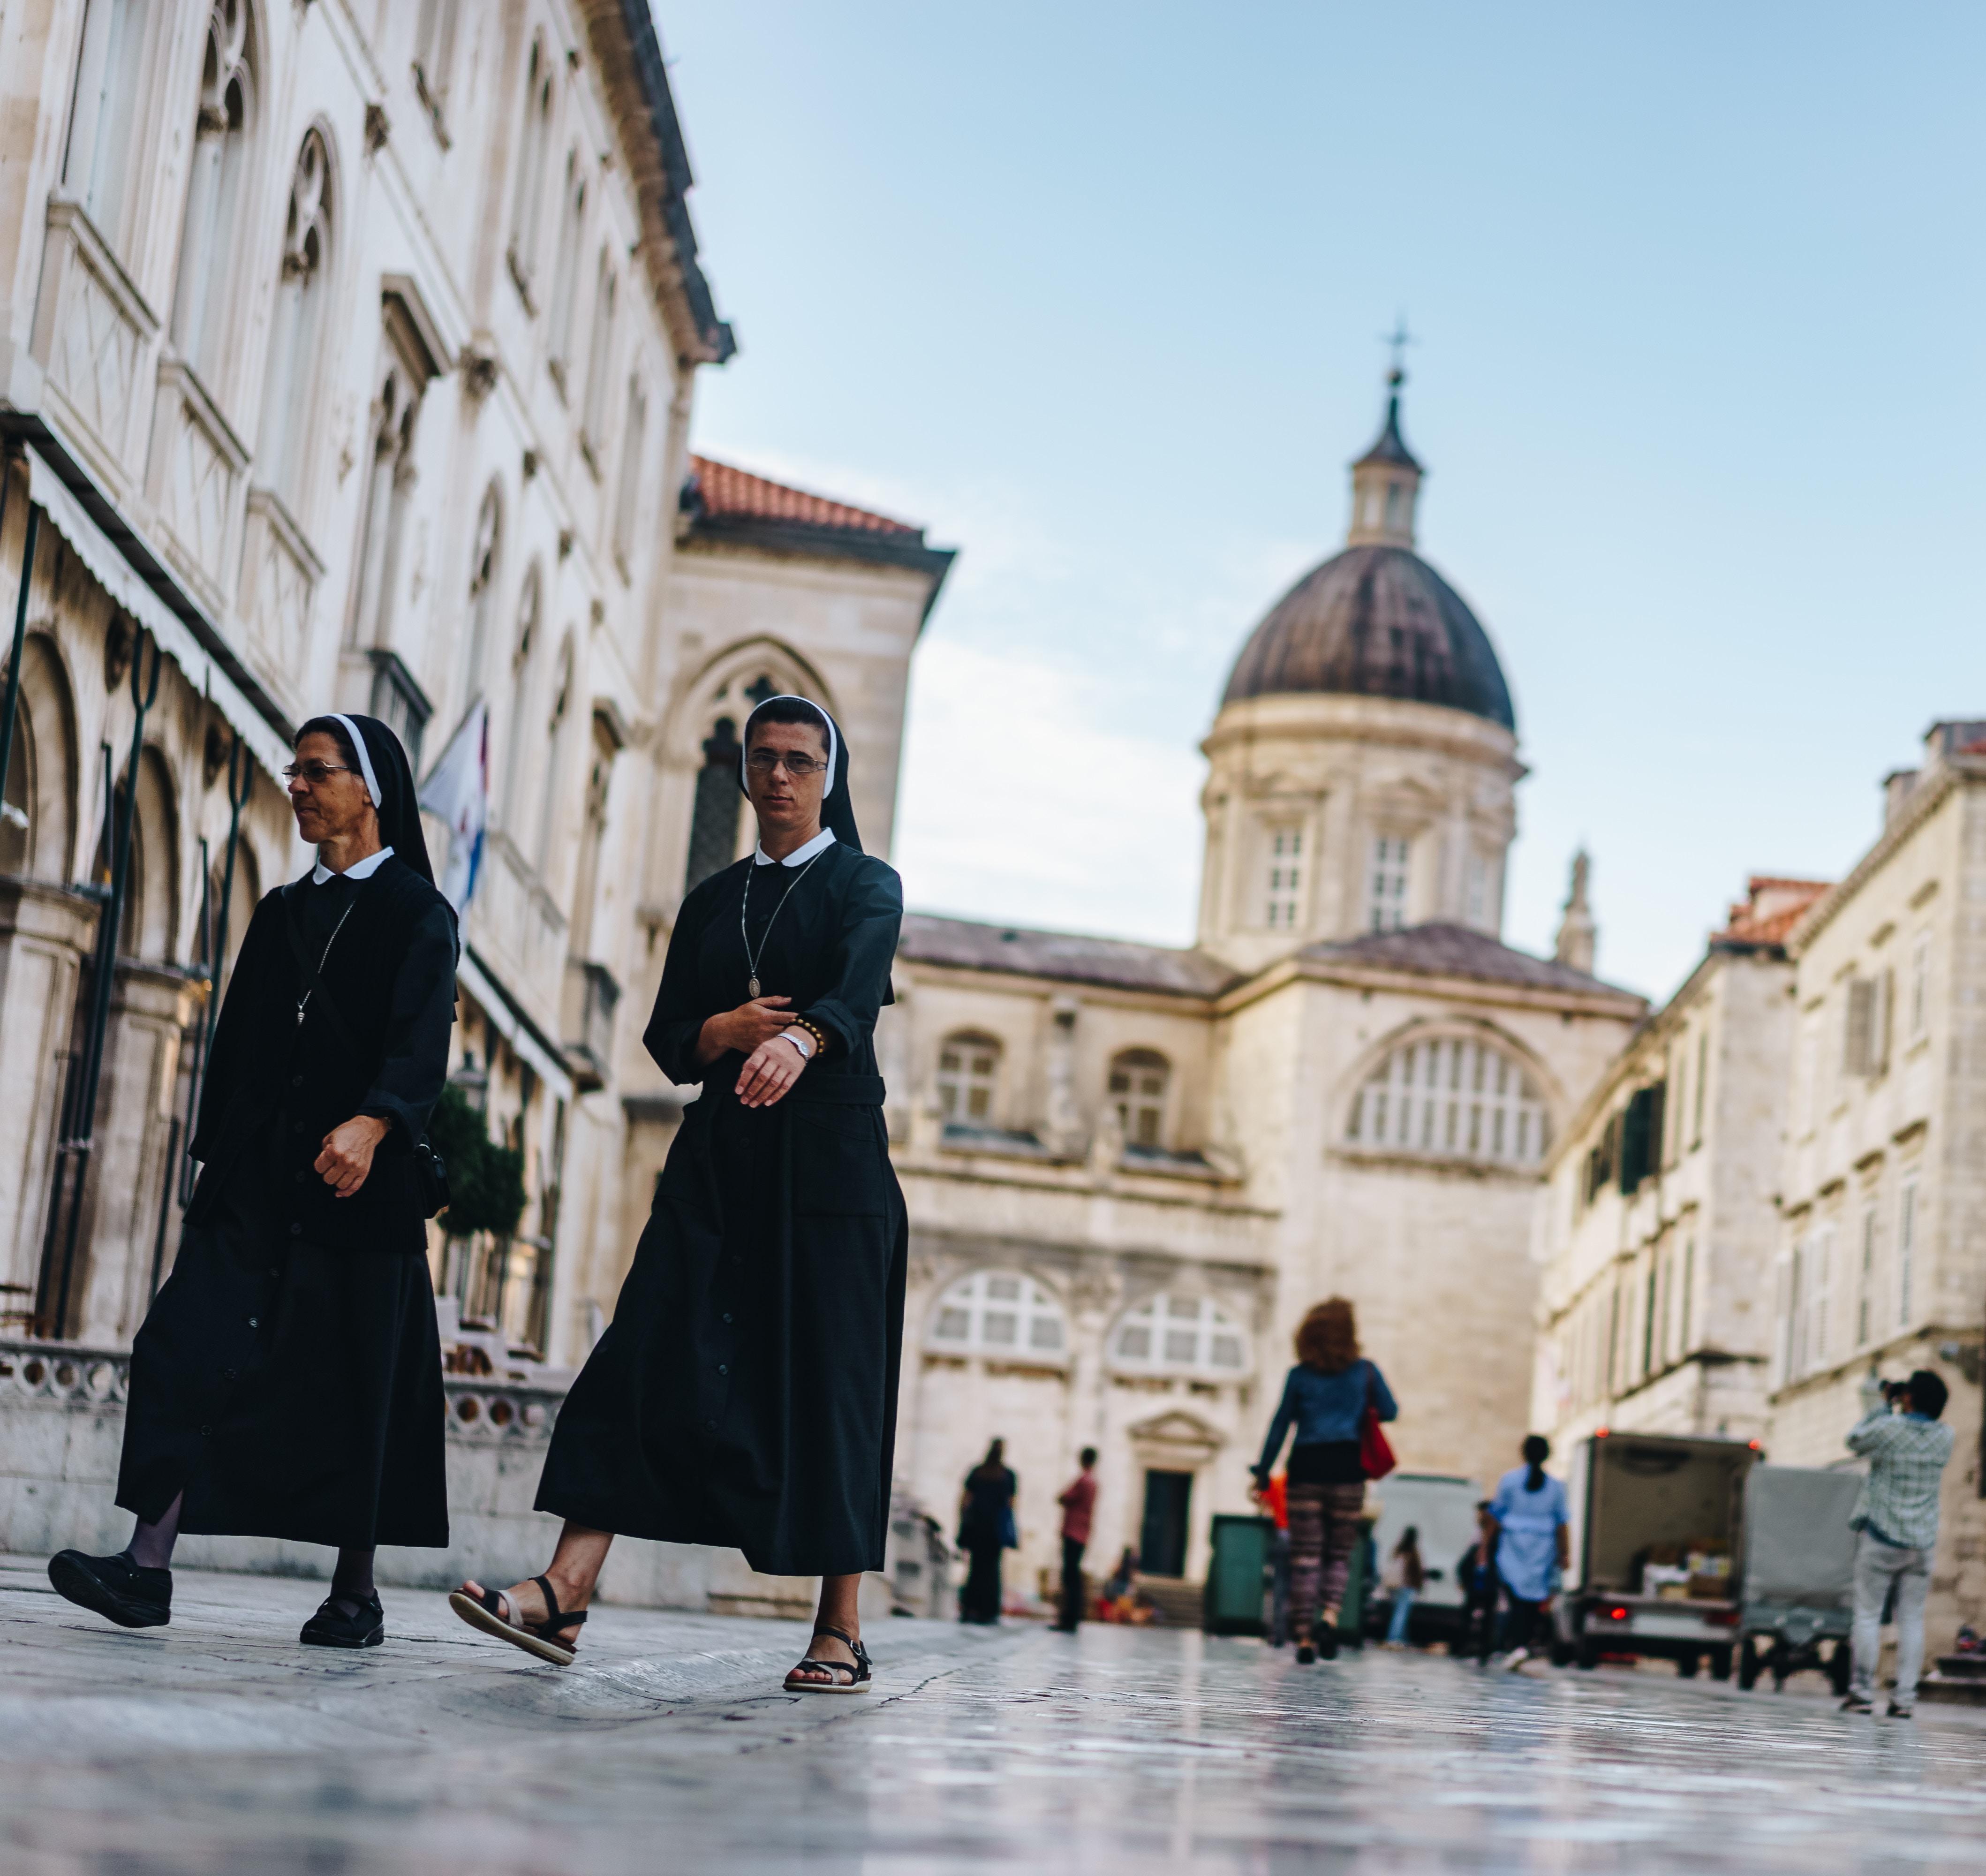 Lieutenant Nun: Freedom Through Violence?